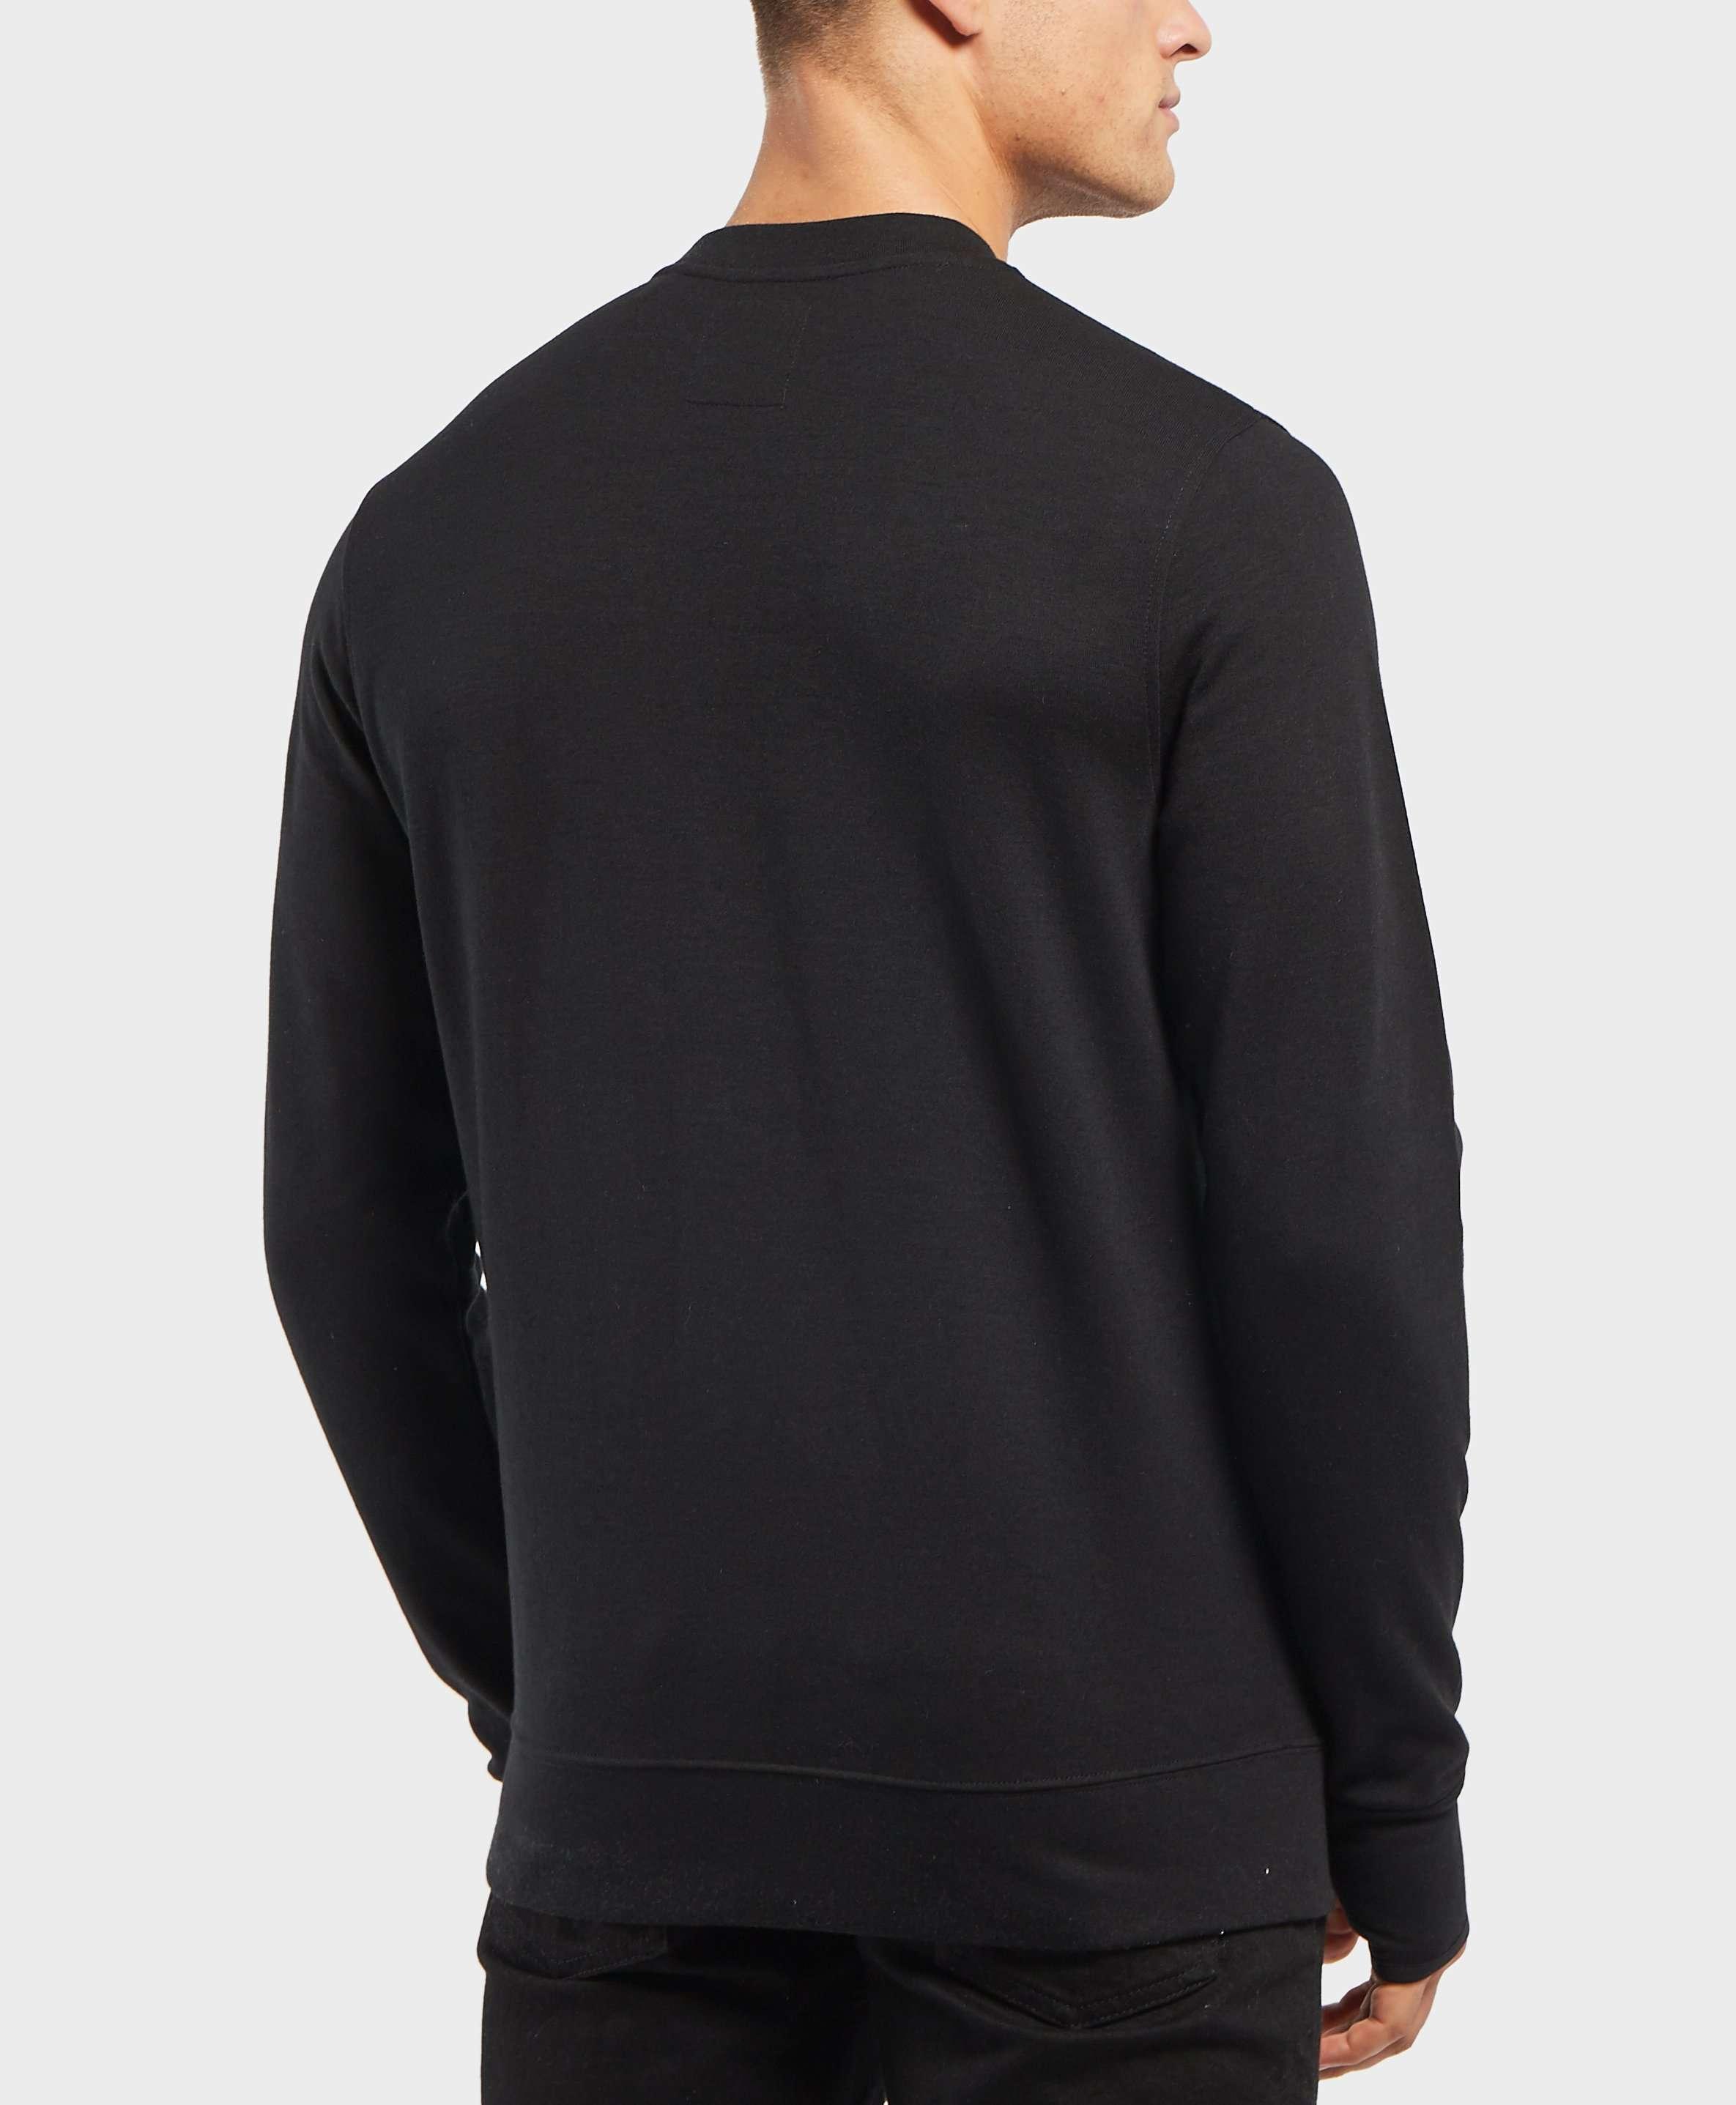 MA STRUM Panel Pocket Sweatshirt